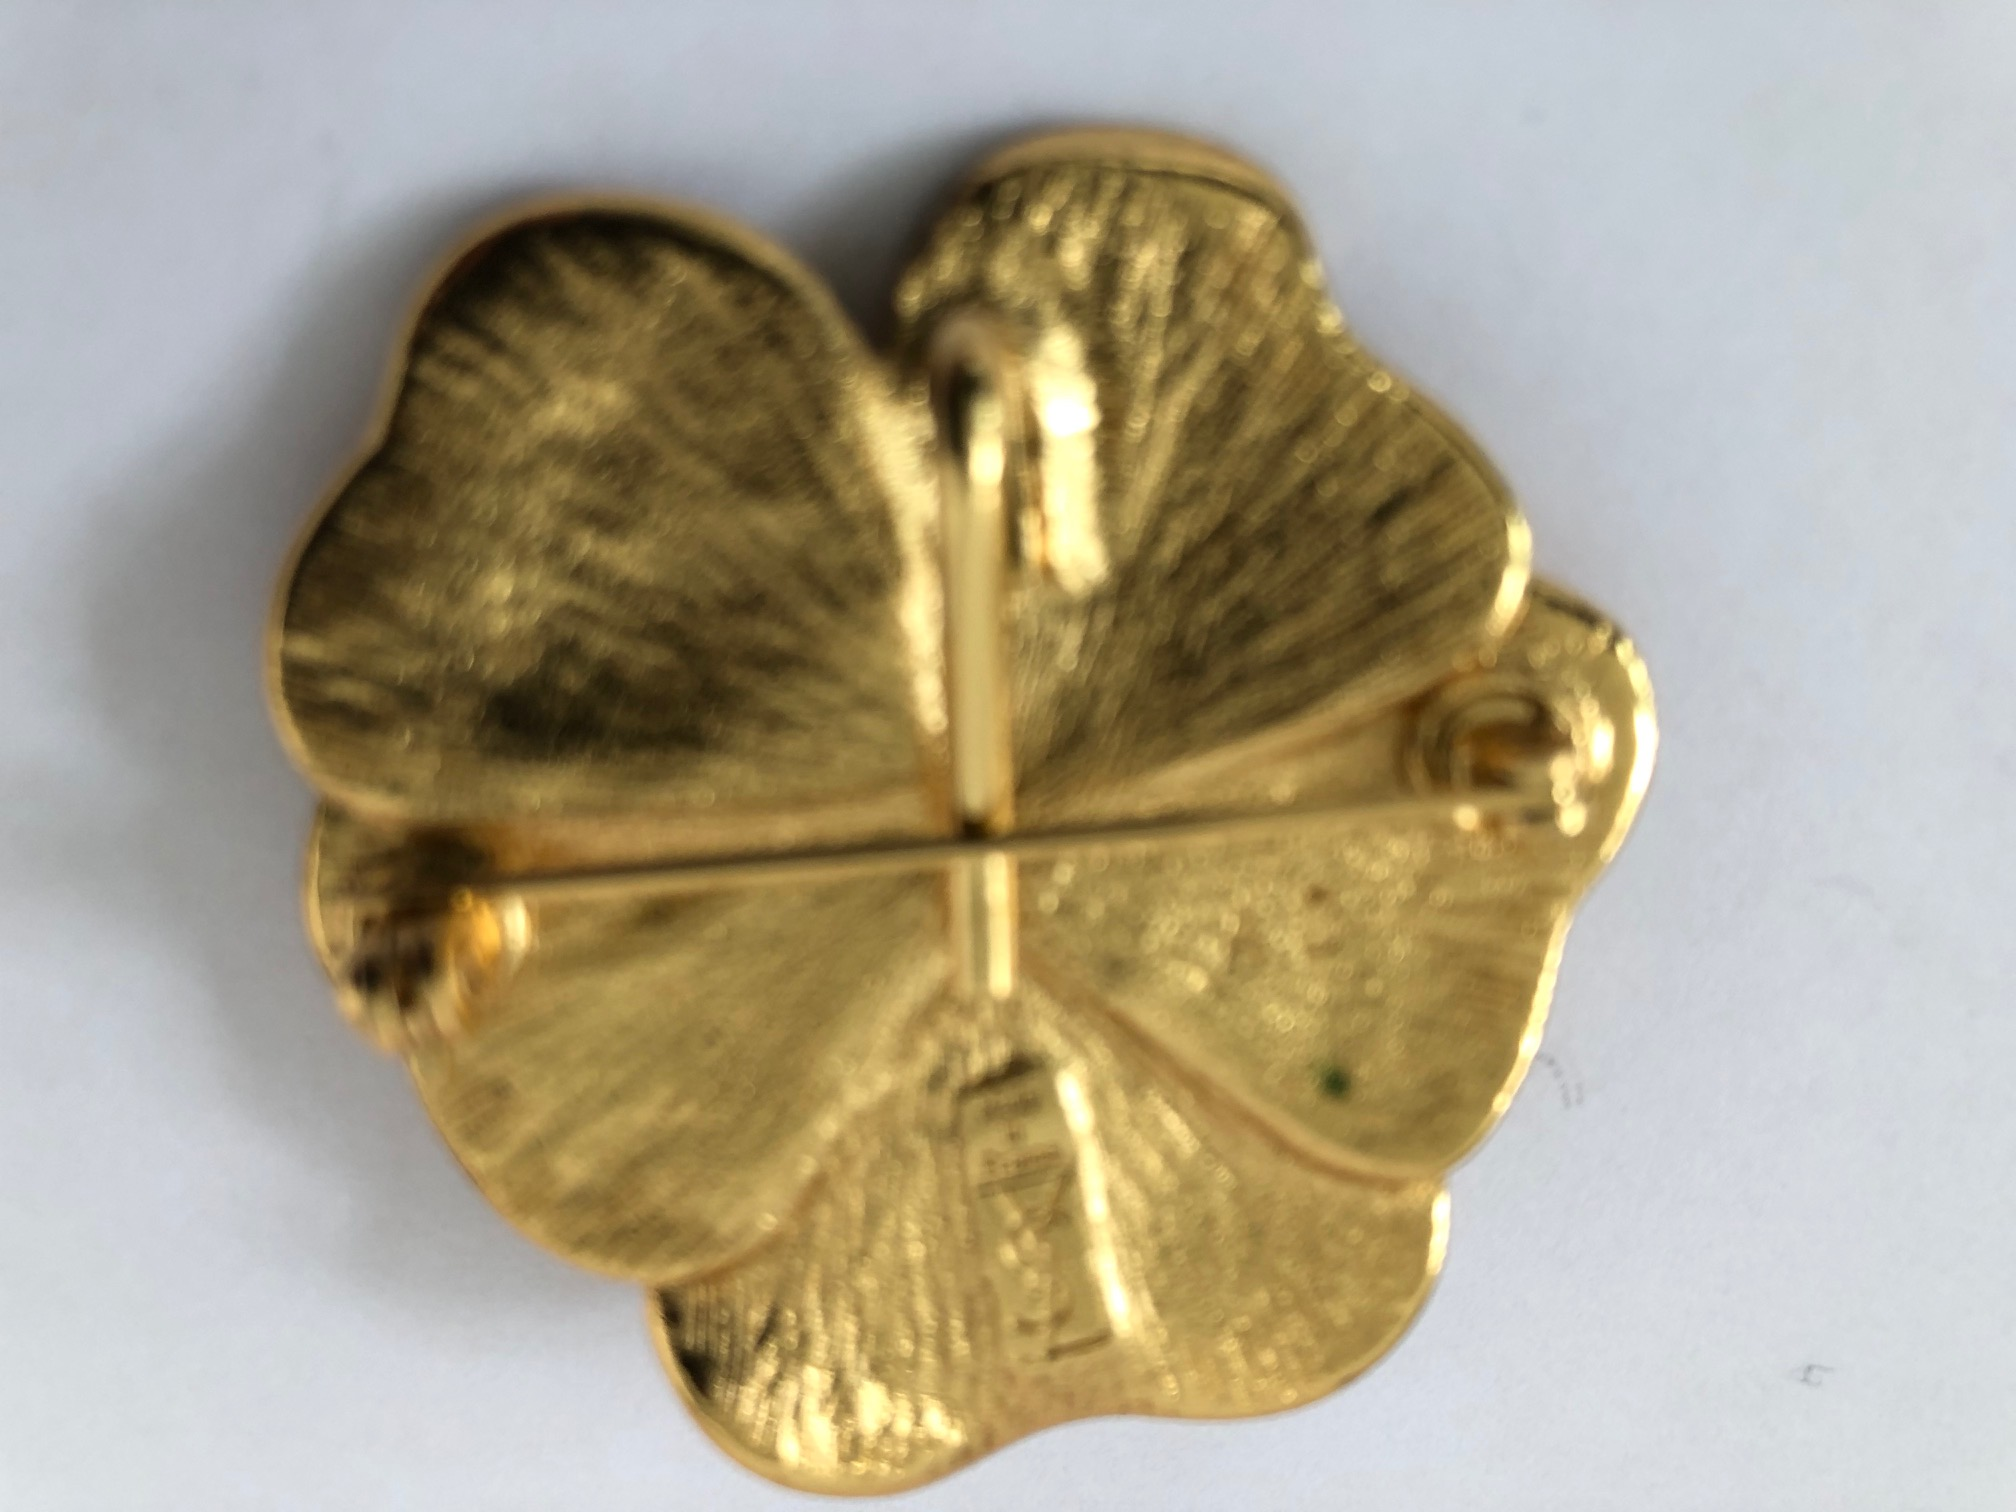 6ce82c3755e YSL YVES SAINT-LAURENT Golden 5-leaf clover Women's Brooches & Pins